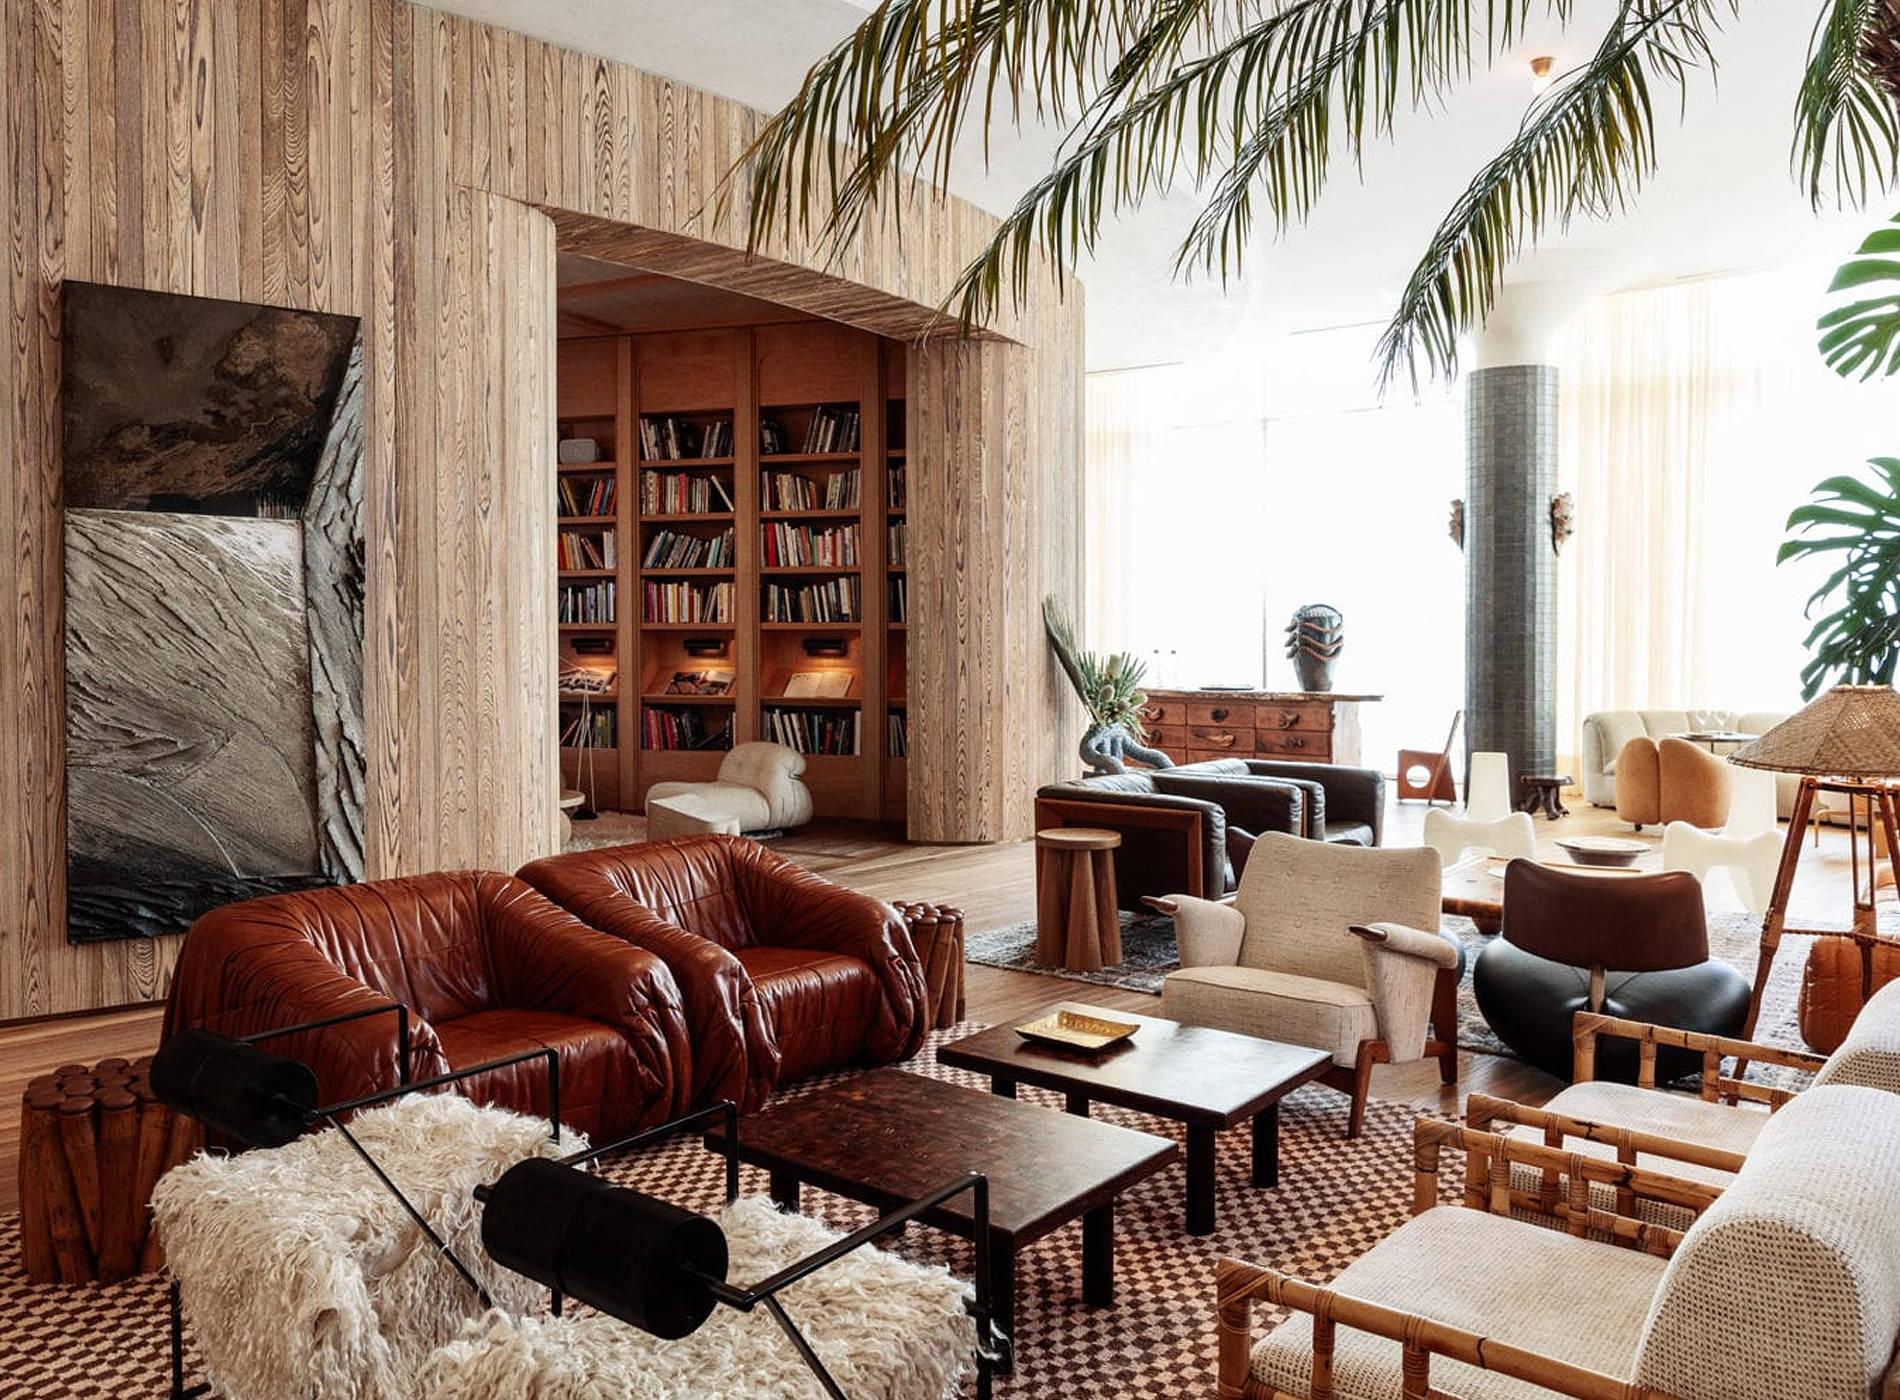 City Guide Santa Monica Proper Hotel Inspiration Espaces